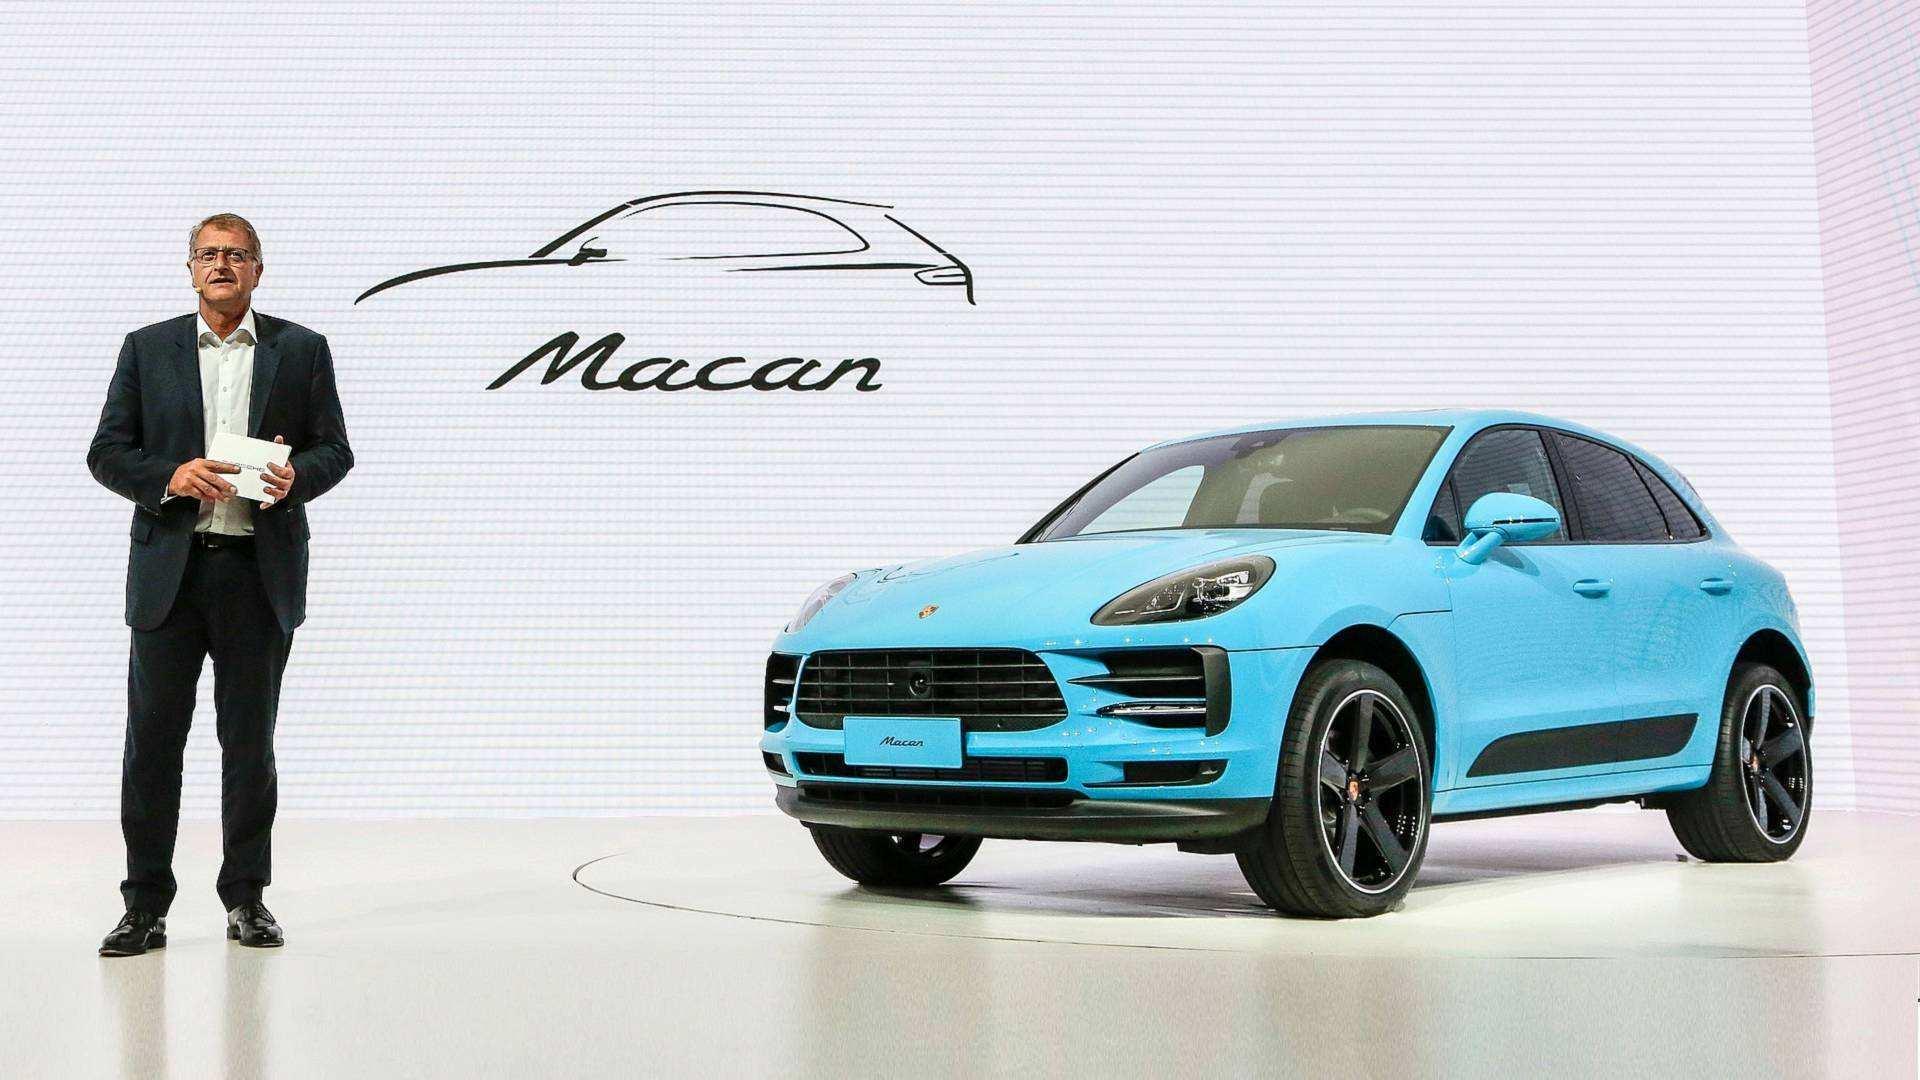 87 Great 2019 Porsche Macan Gts Concept with 2019 Porsche Macan Gts